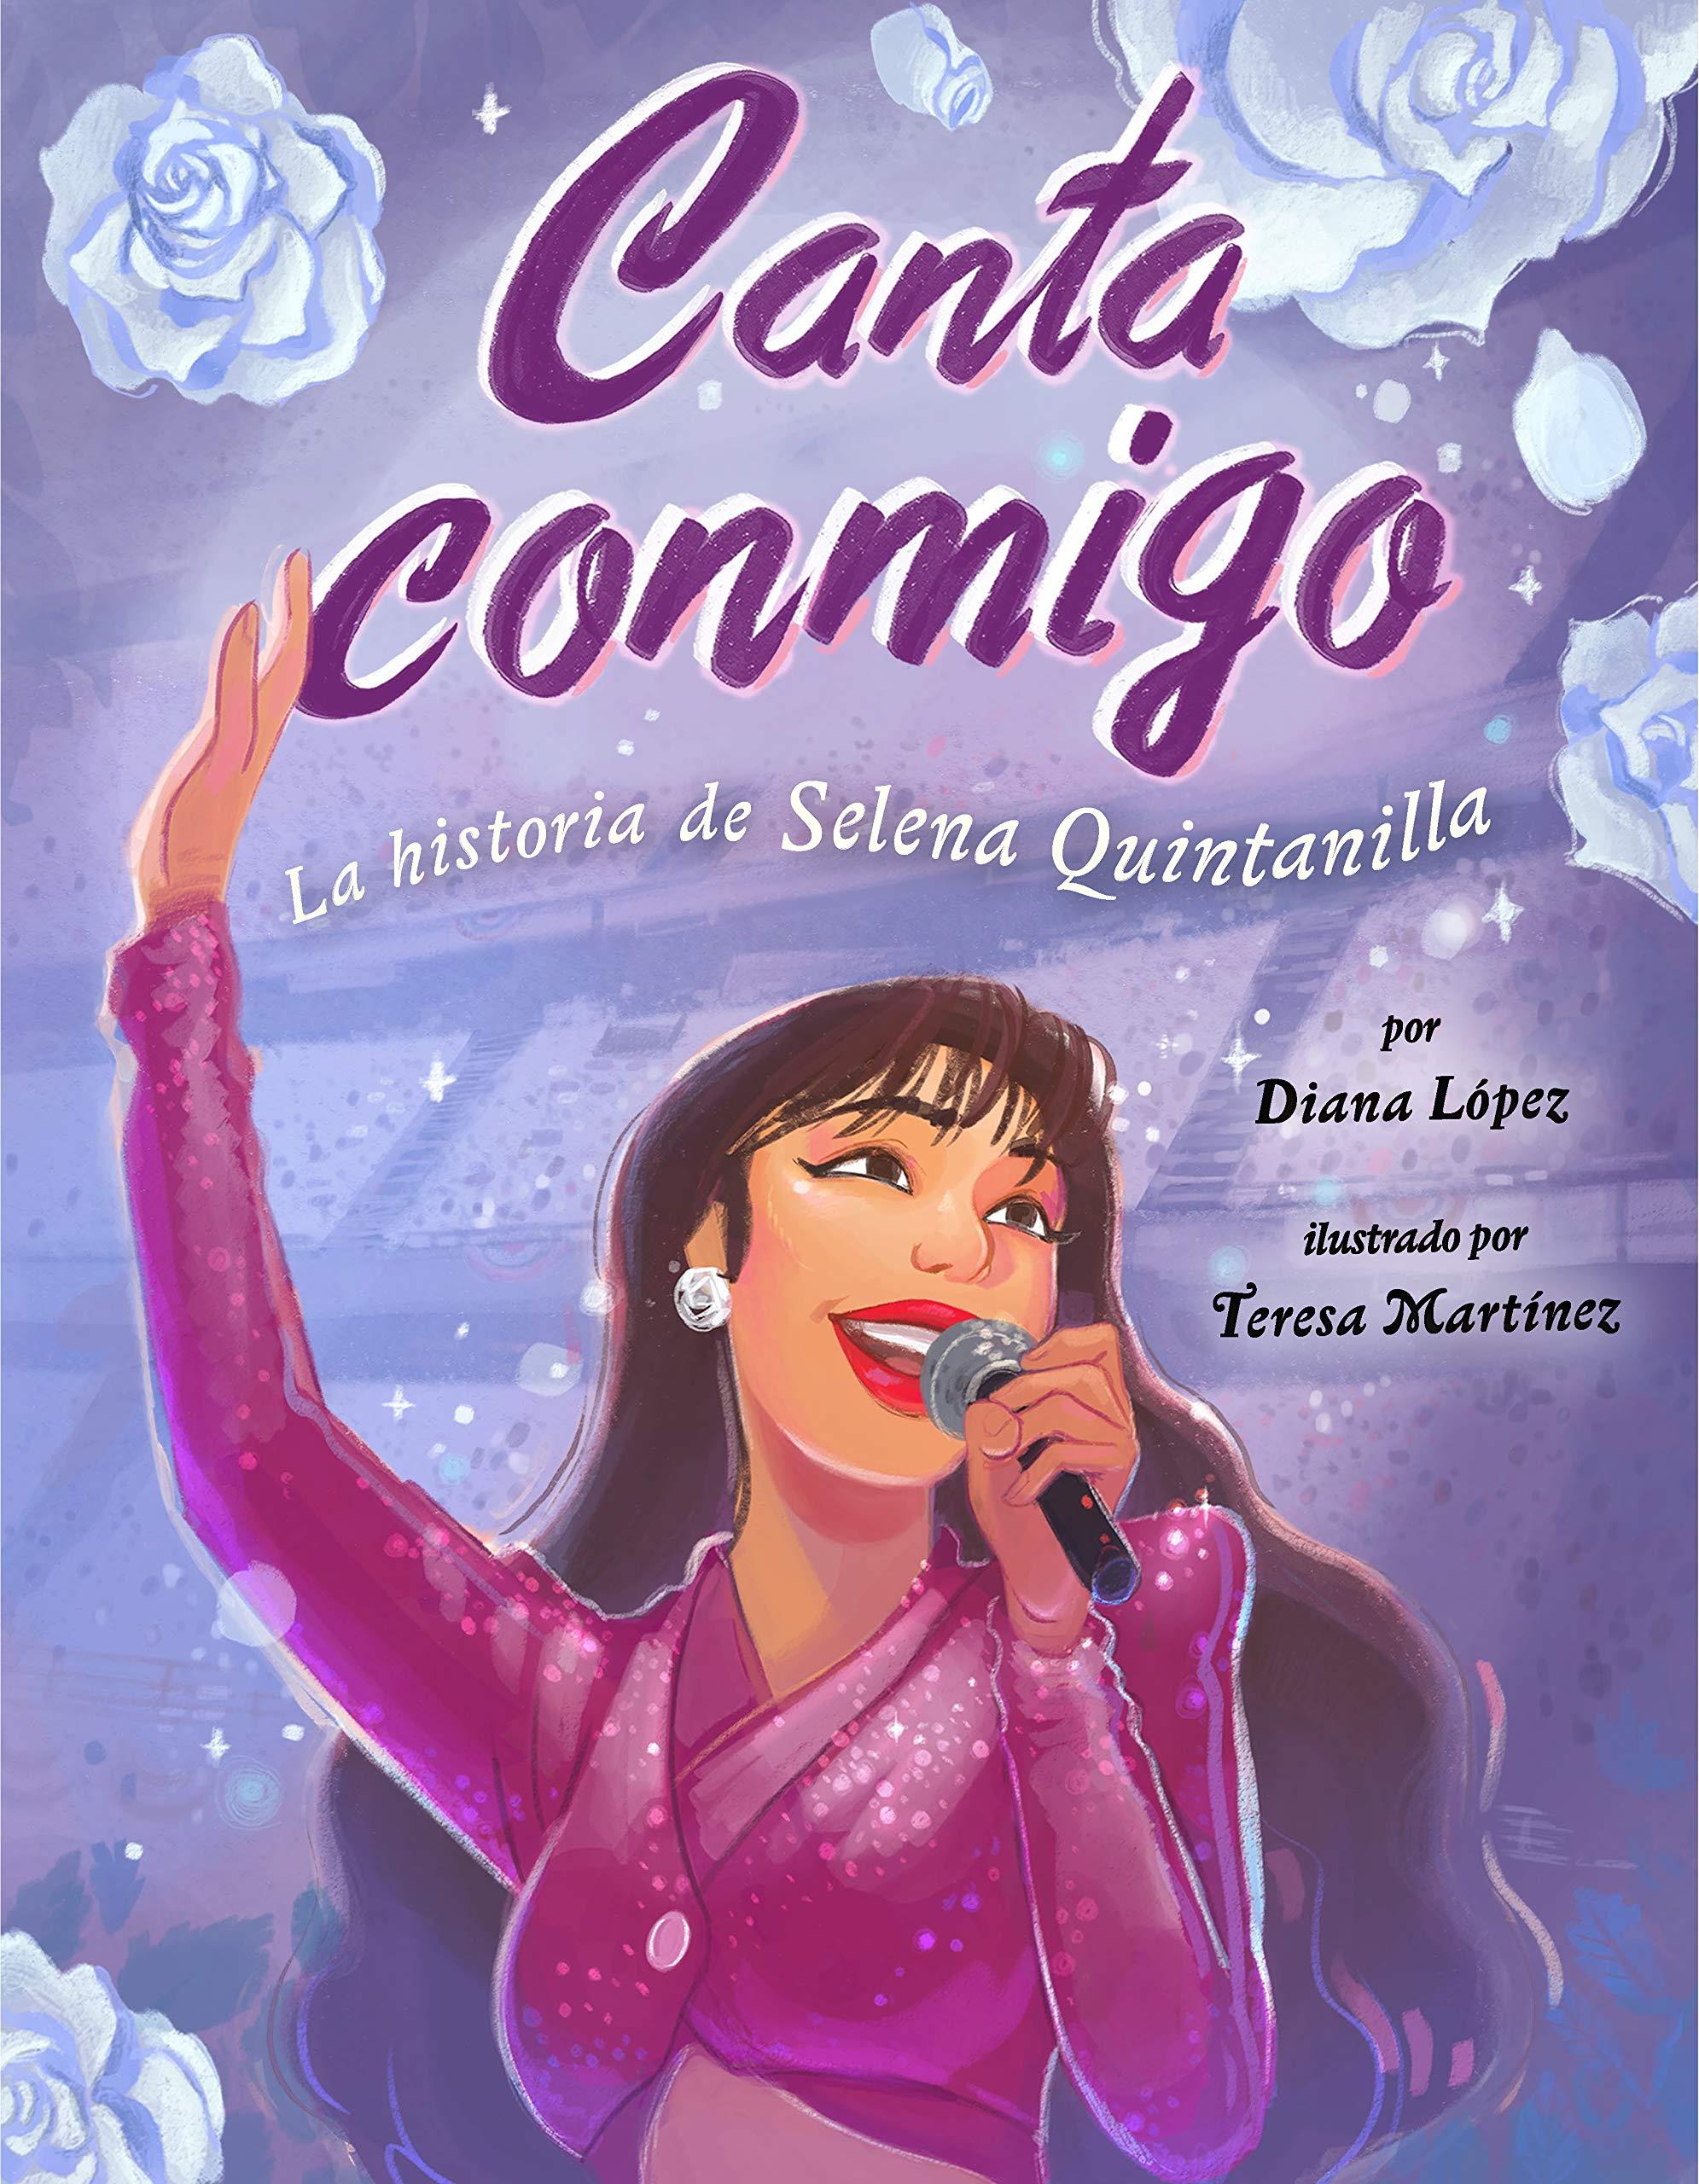 Canta conmigo: La historia de Selena Quintanilla (Spanish Edition): López,  Diana, Martinez, Teresa: 9780593323304: Amazon.com: Books